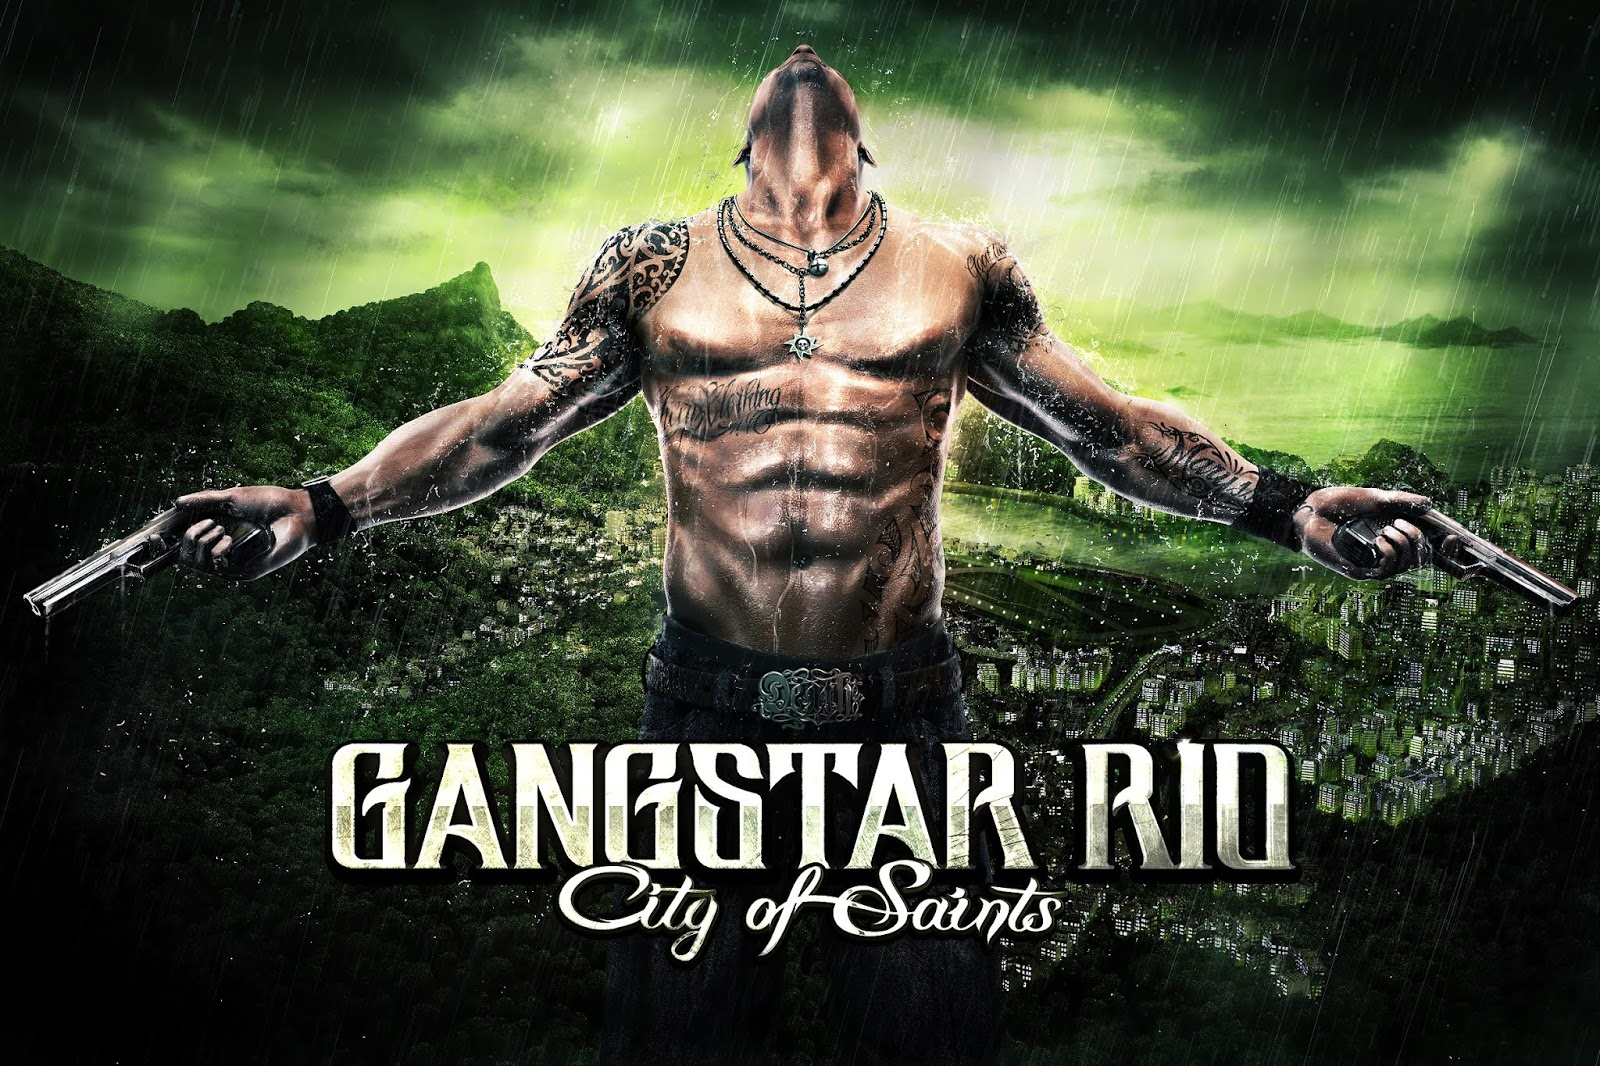 gangstar rio city of saints mod apk highly compressed